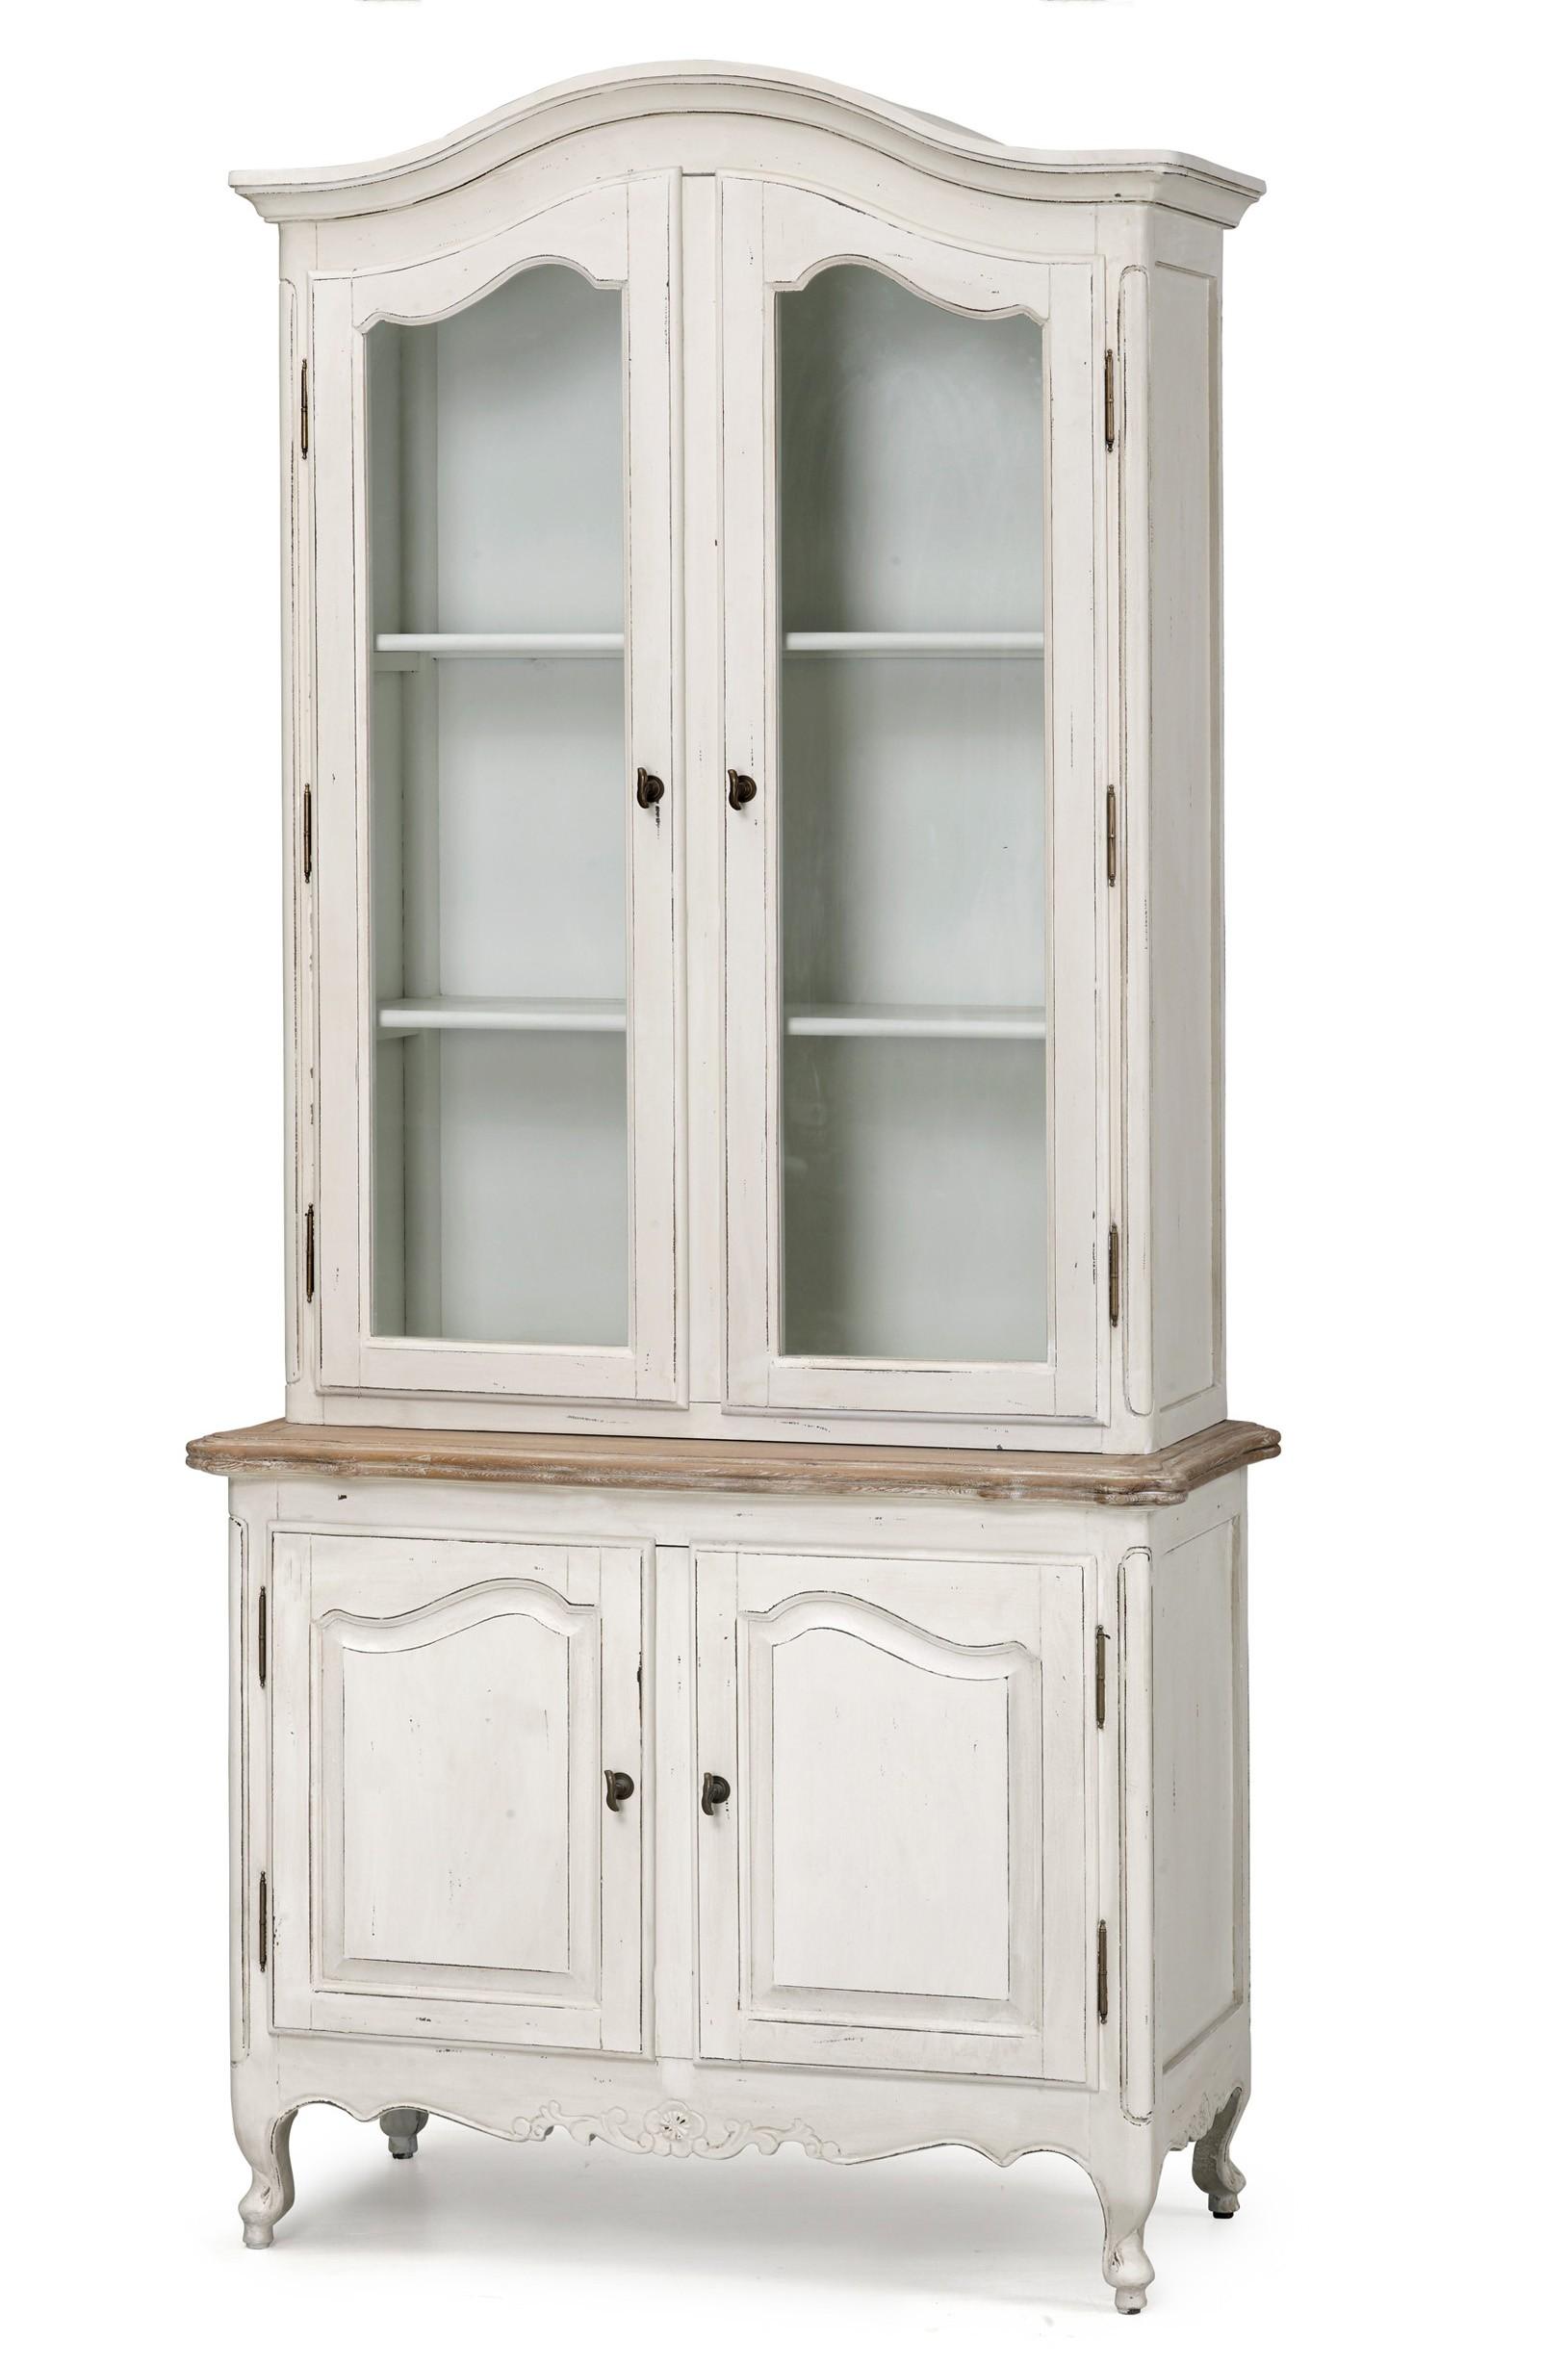 french_provincial_display_cupboard.jpg